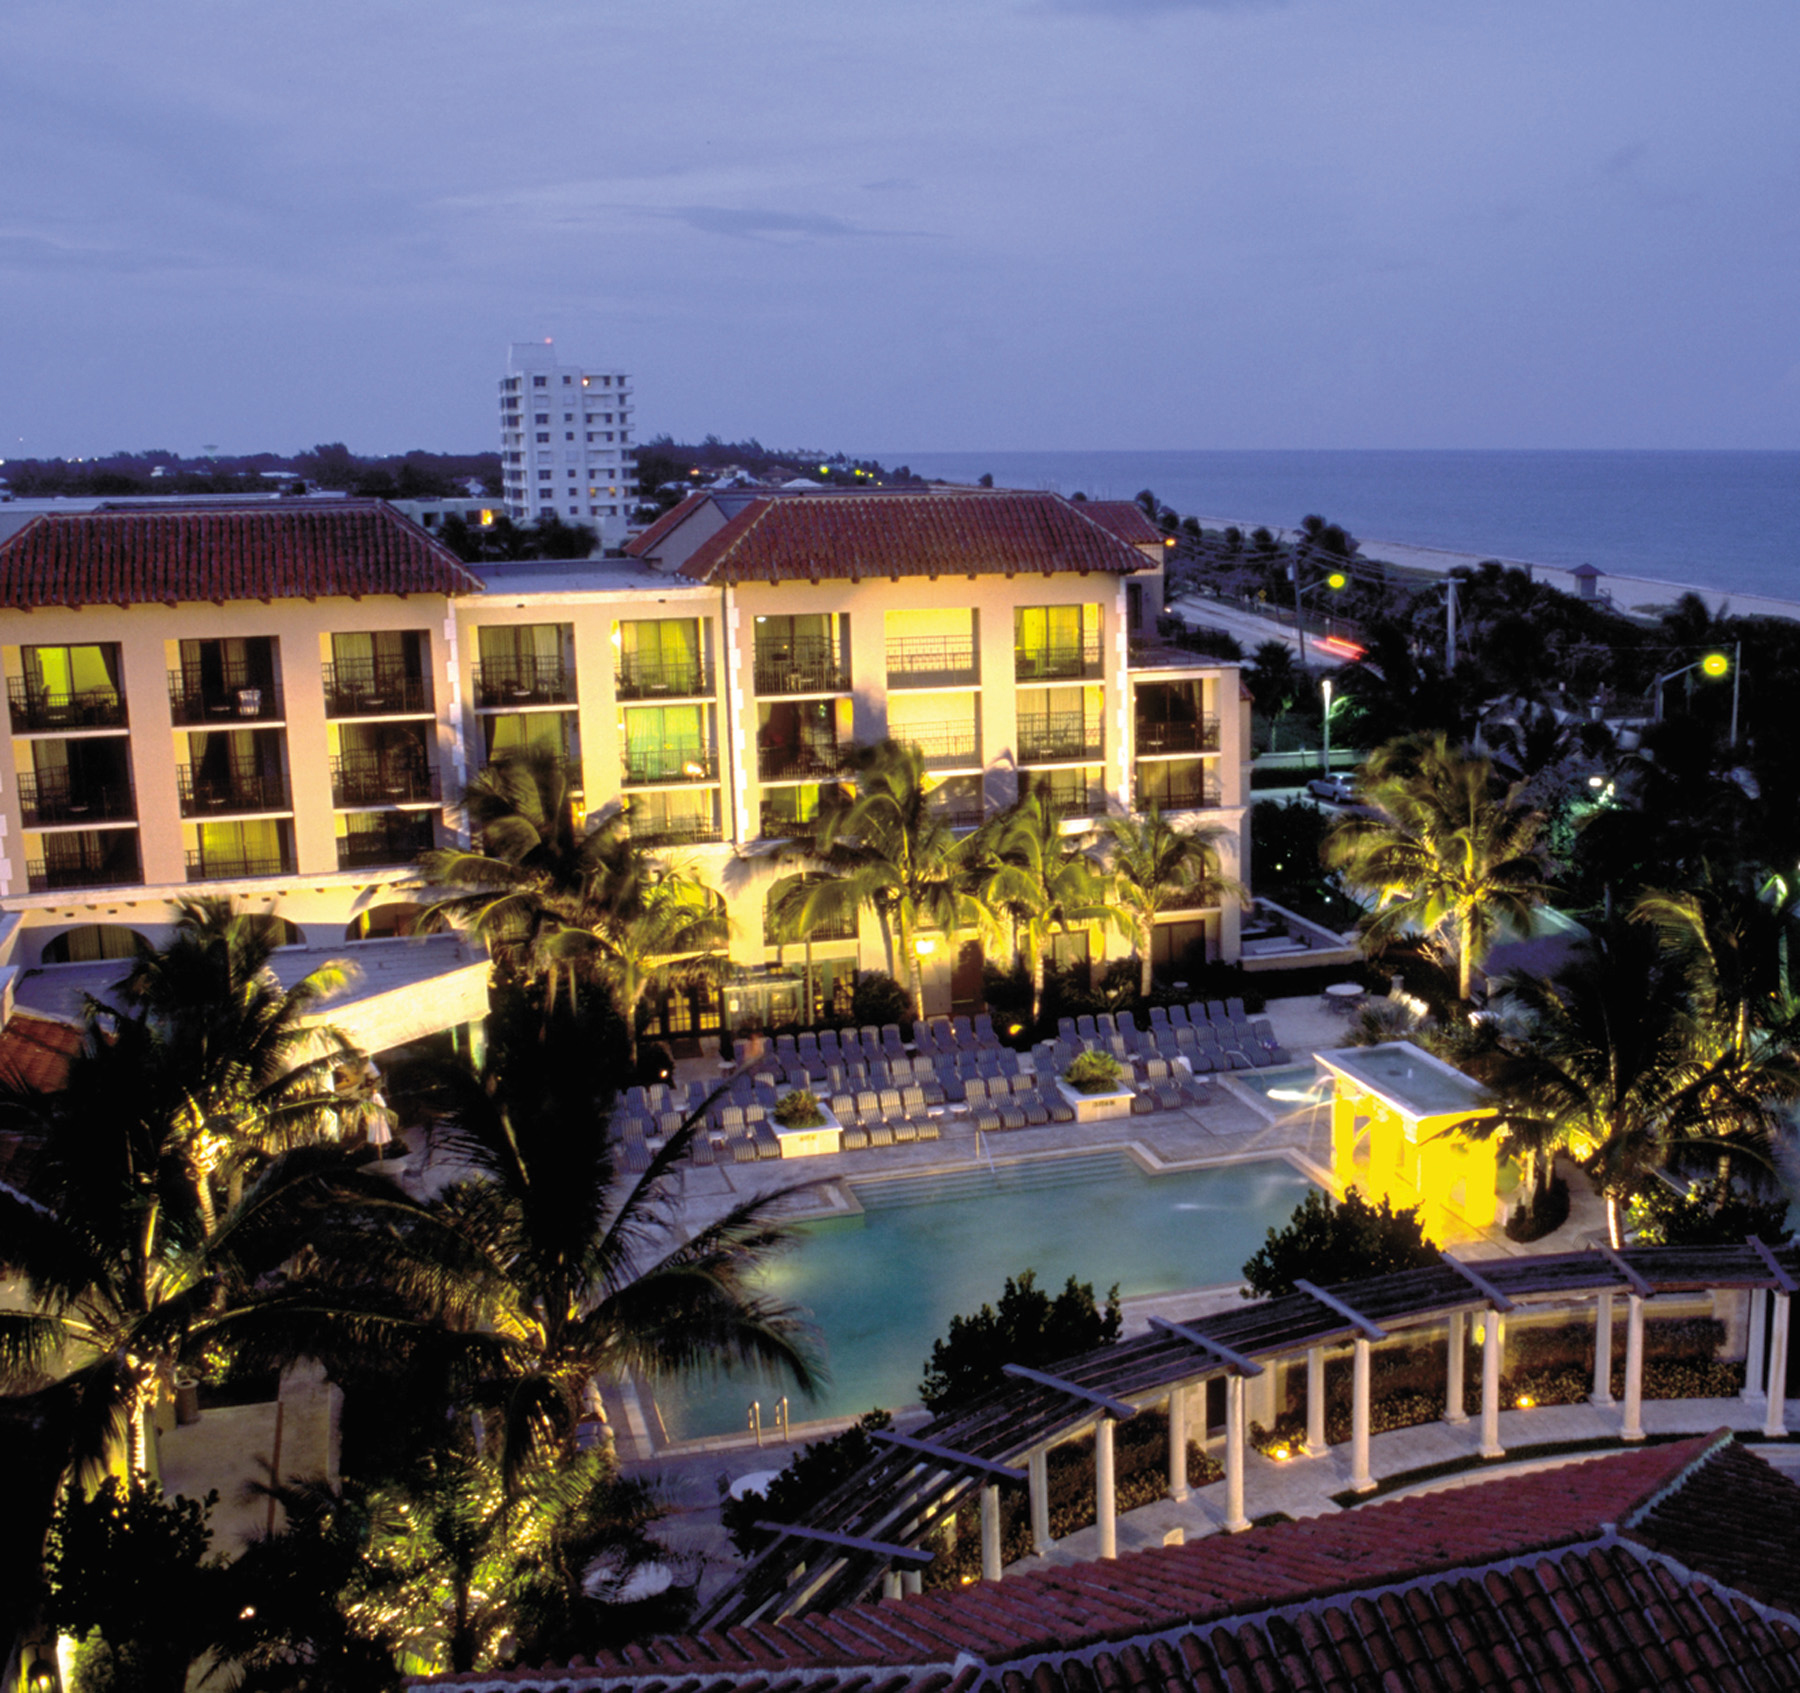 The Delray Beach Marriott.